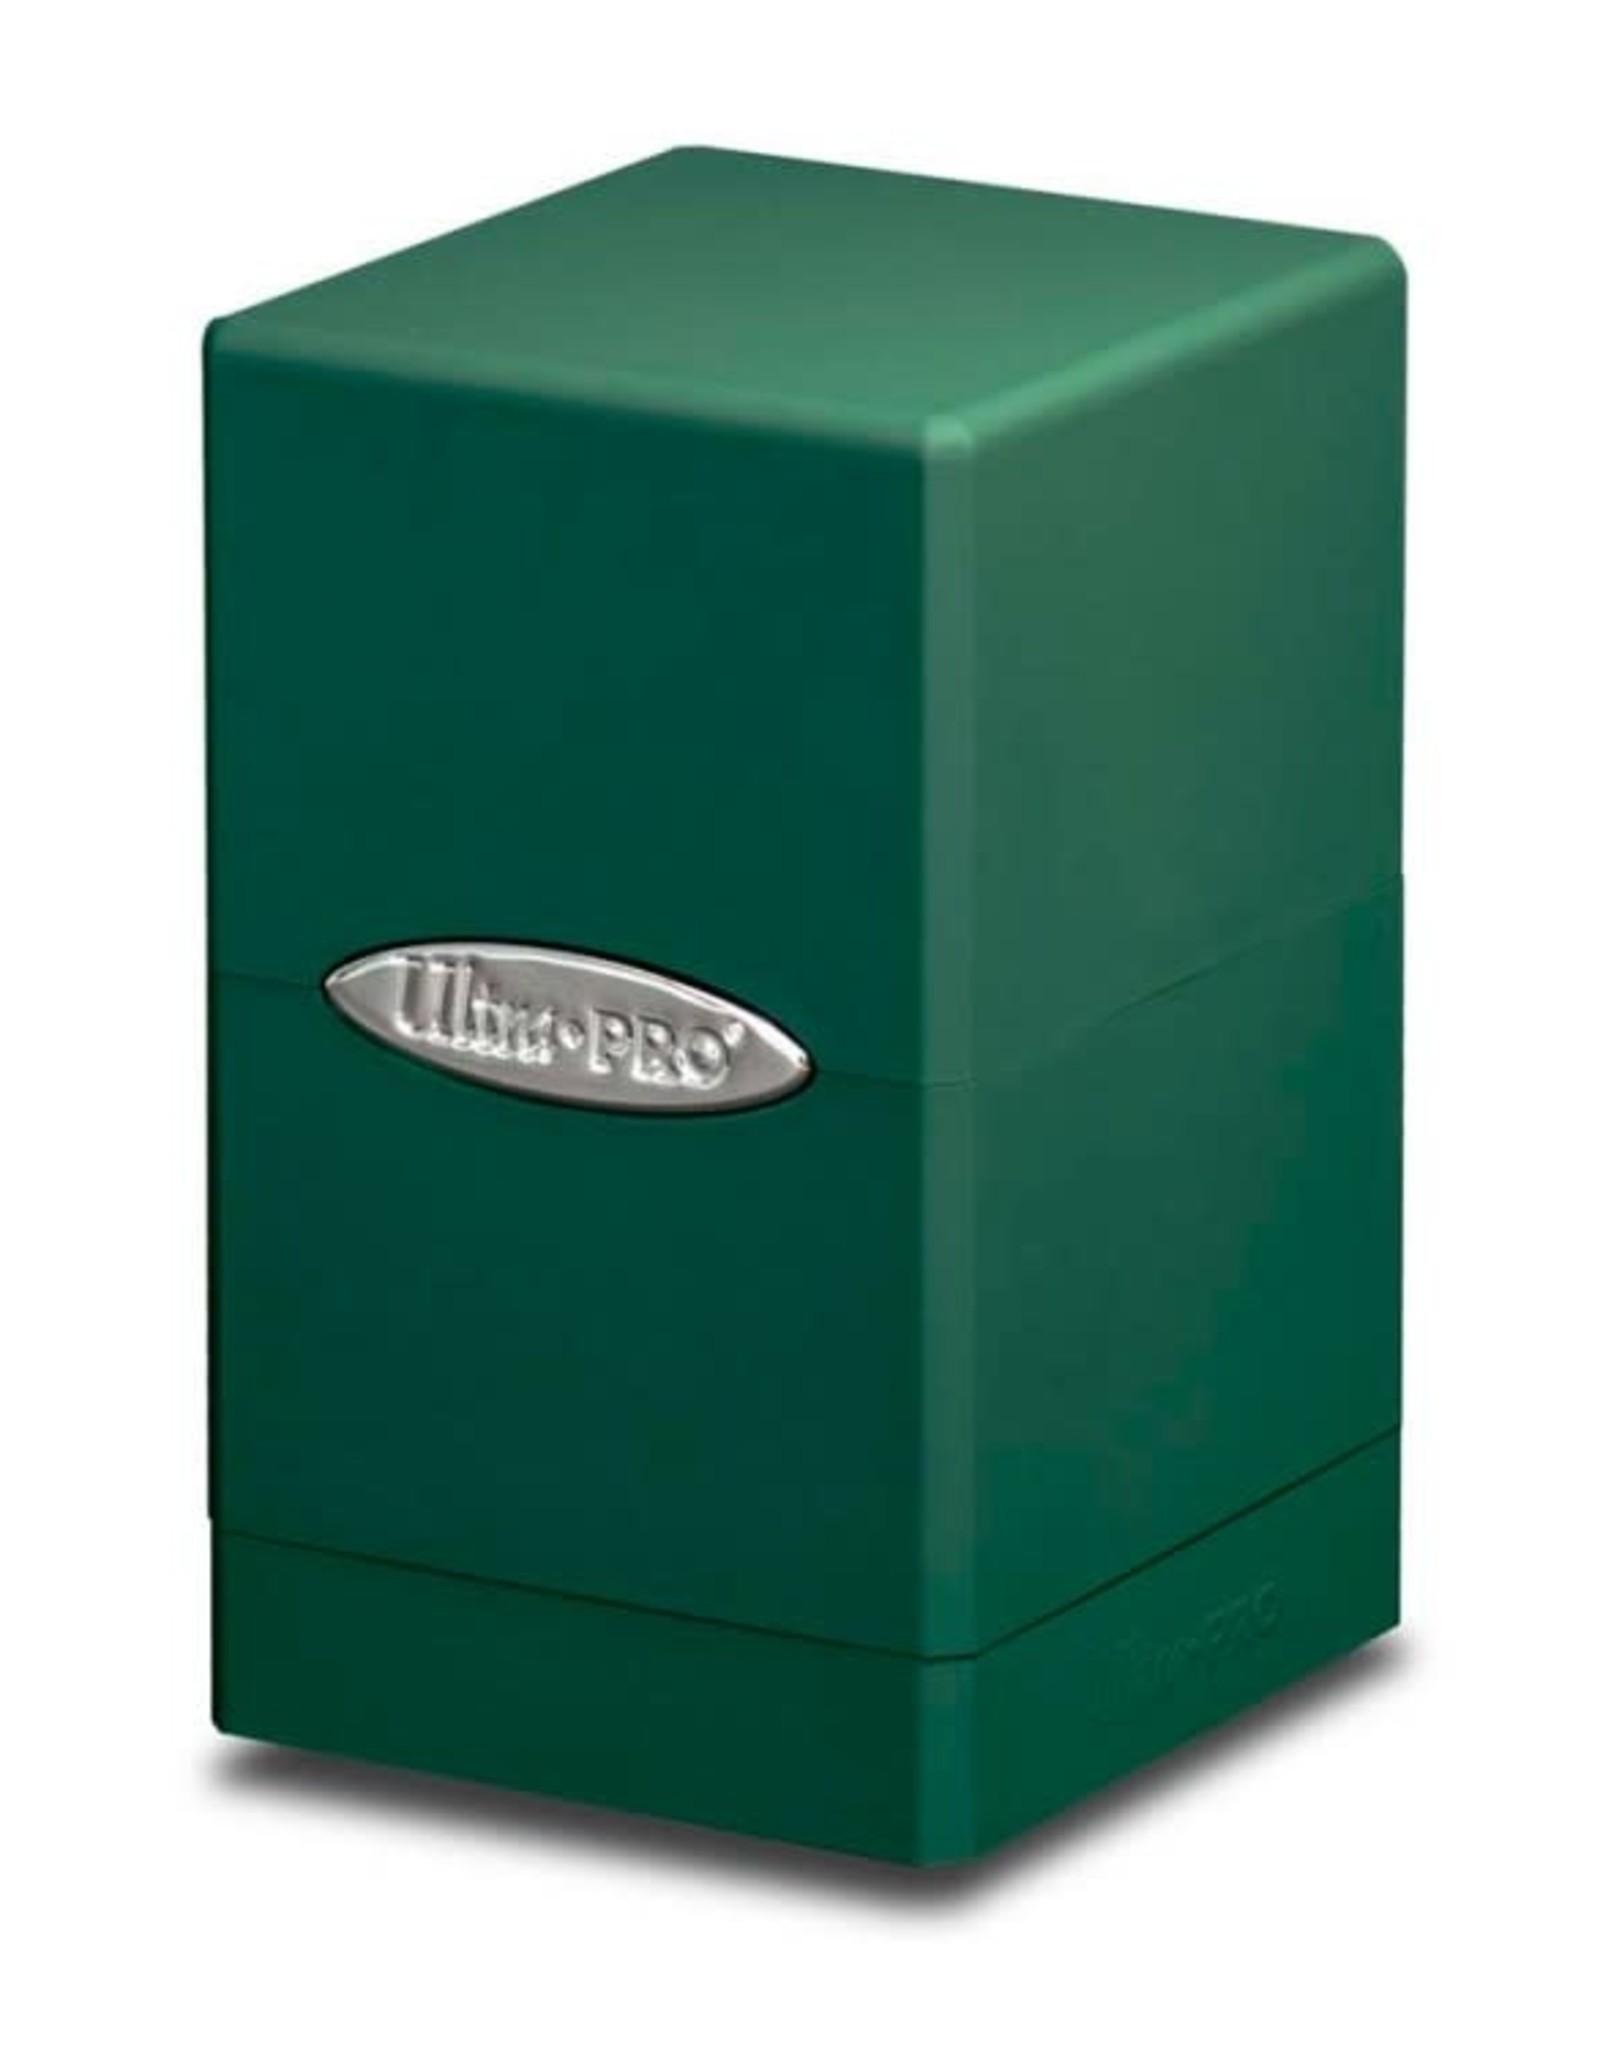 Ultra Pro Satin Tower Deck Box: Green